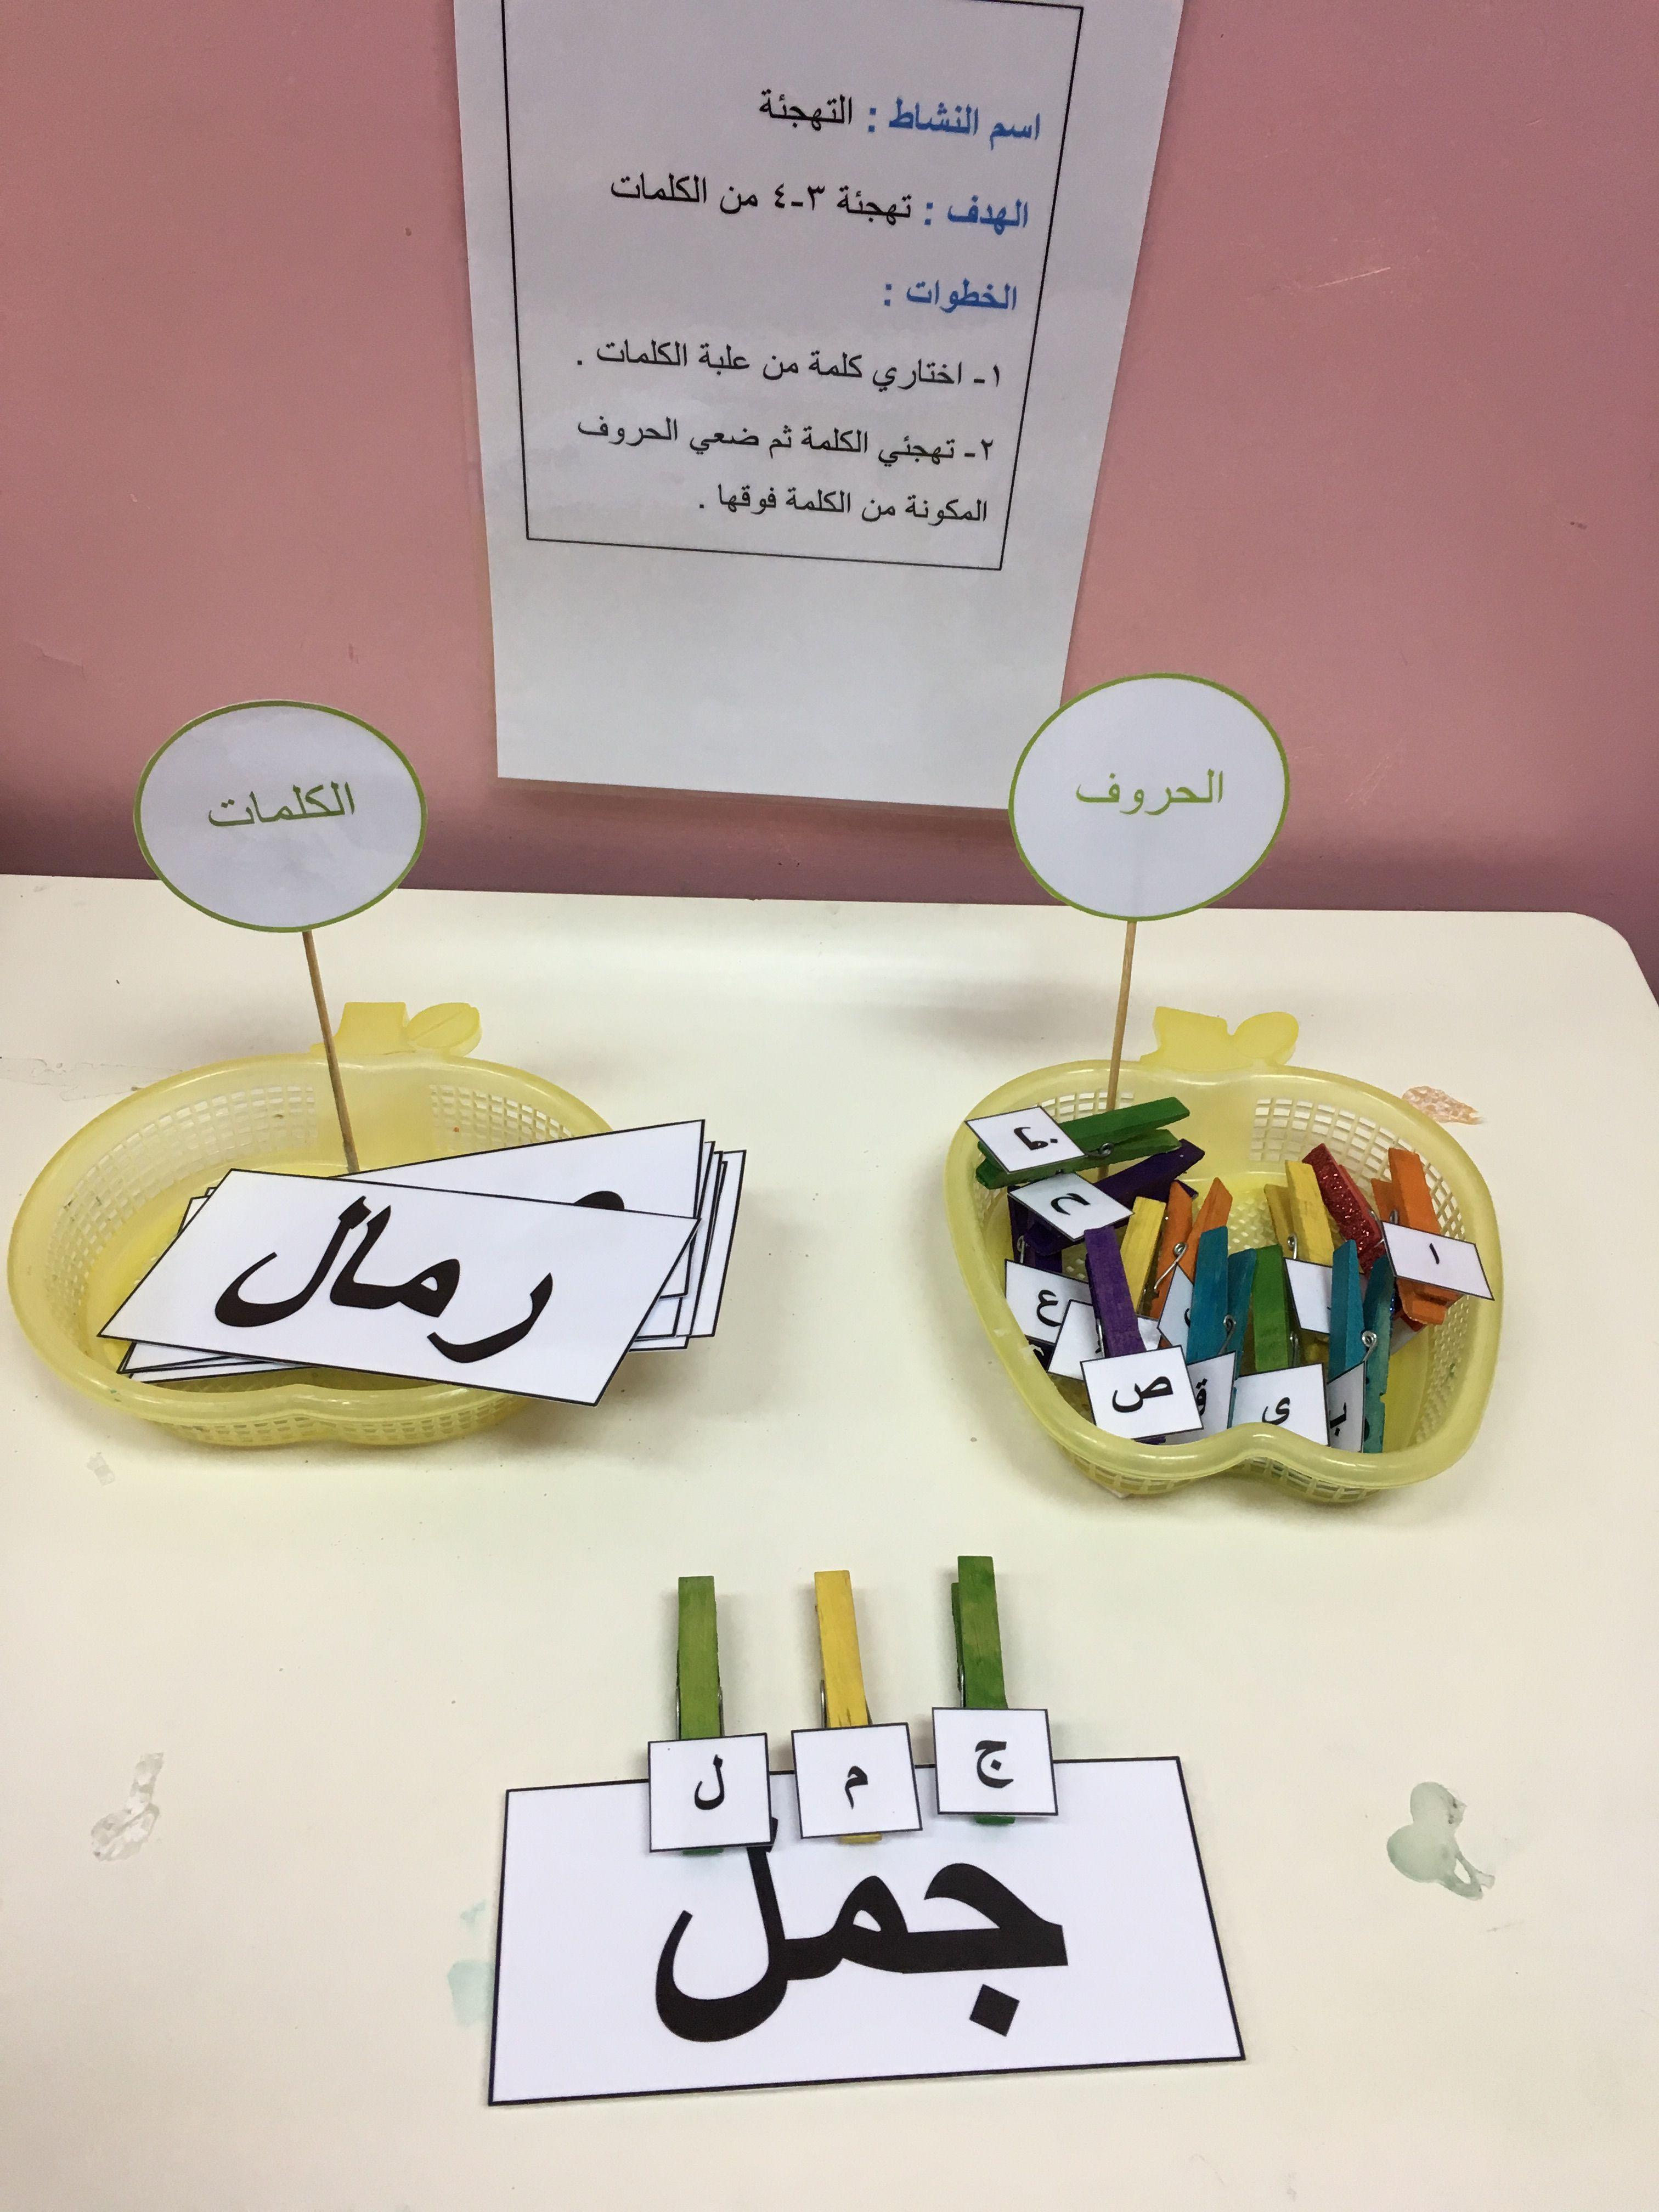 How To Learning Arabic Arabic Alphabet For Kids Learn Arabic Alphabet